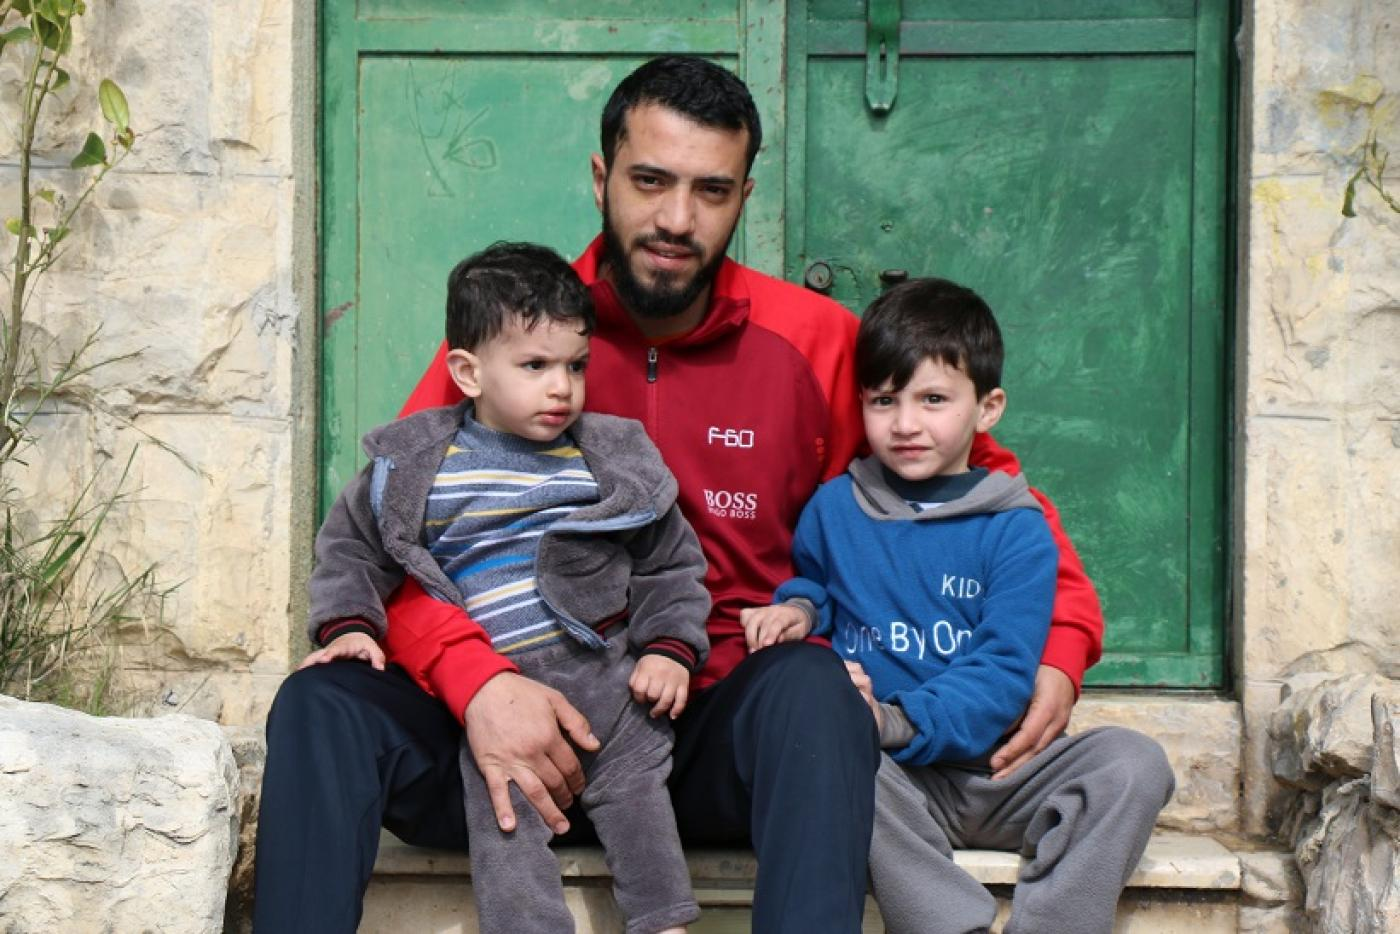 Abdel Qader Abou Srour et ses deux jeunes garçons (MEE/Akram al-Waara)